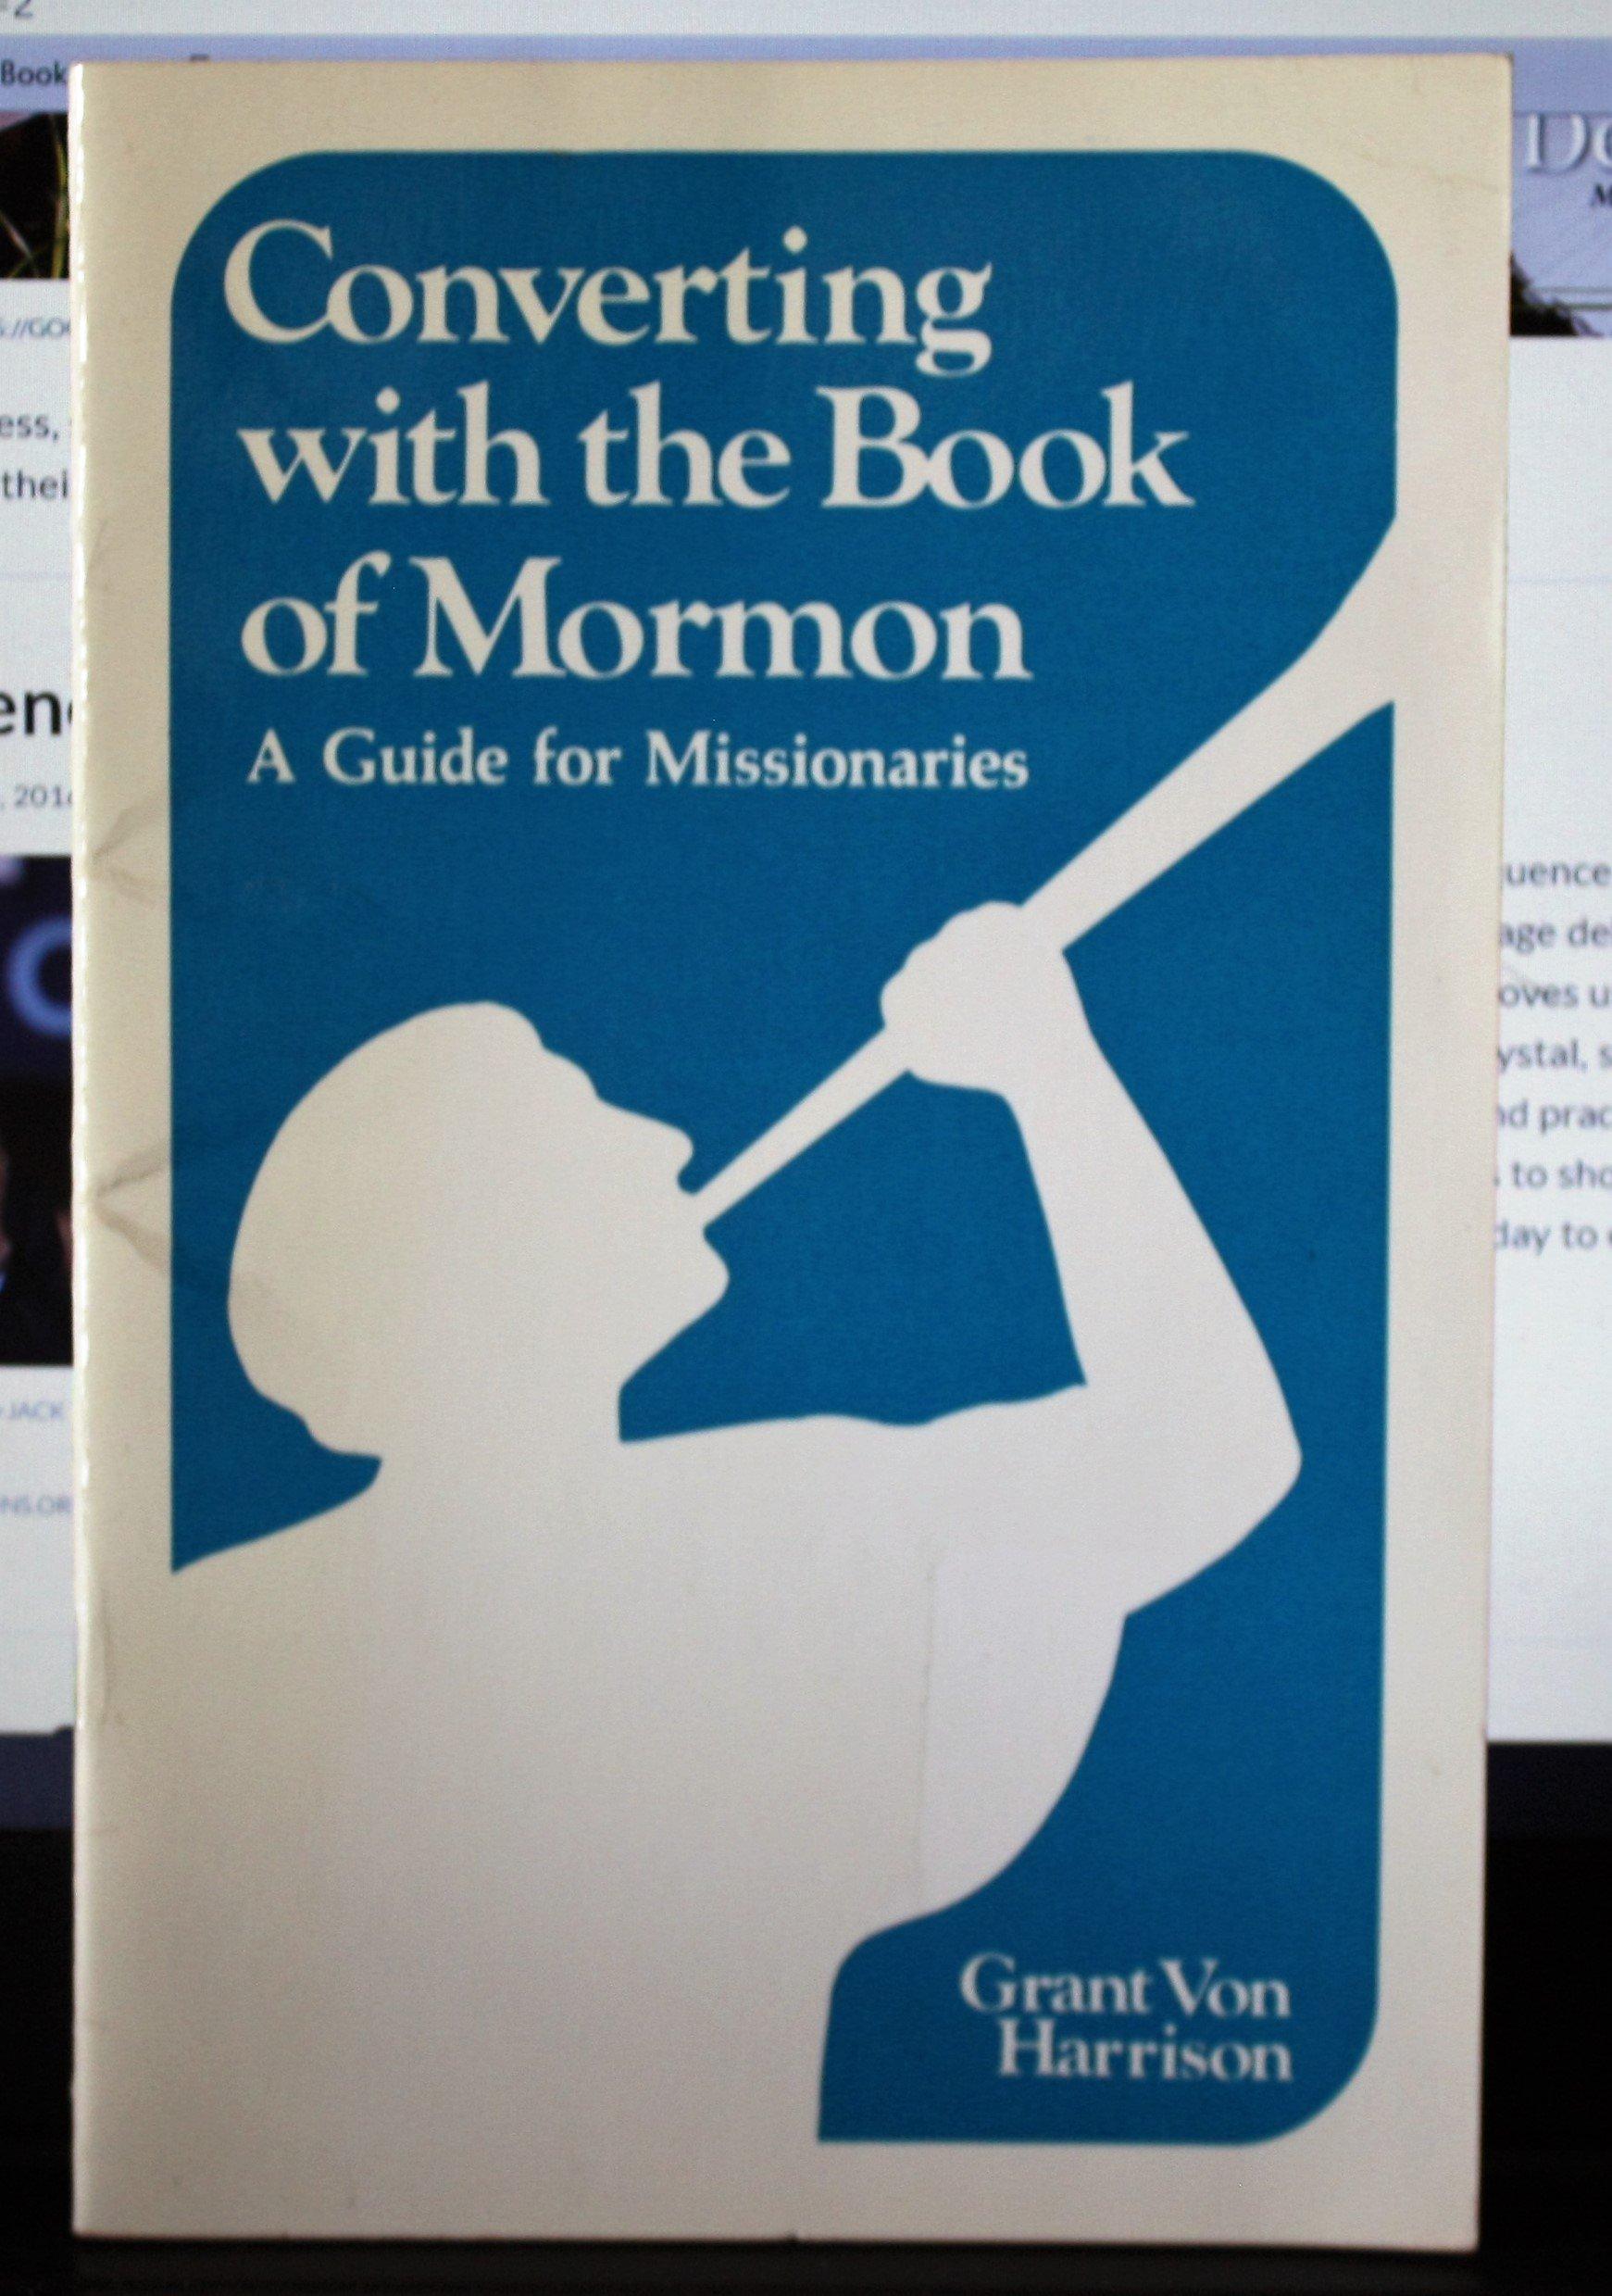 the book of mormon in conversion